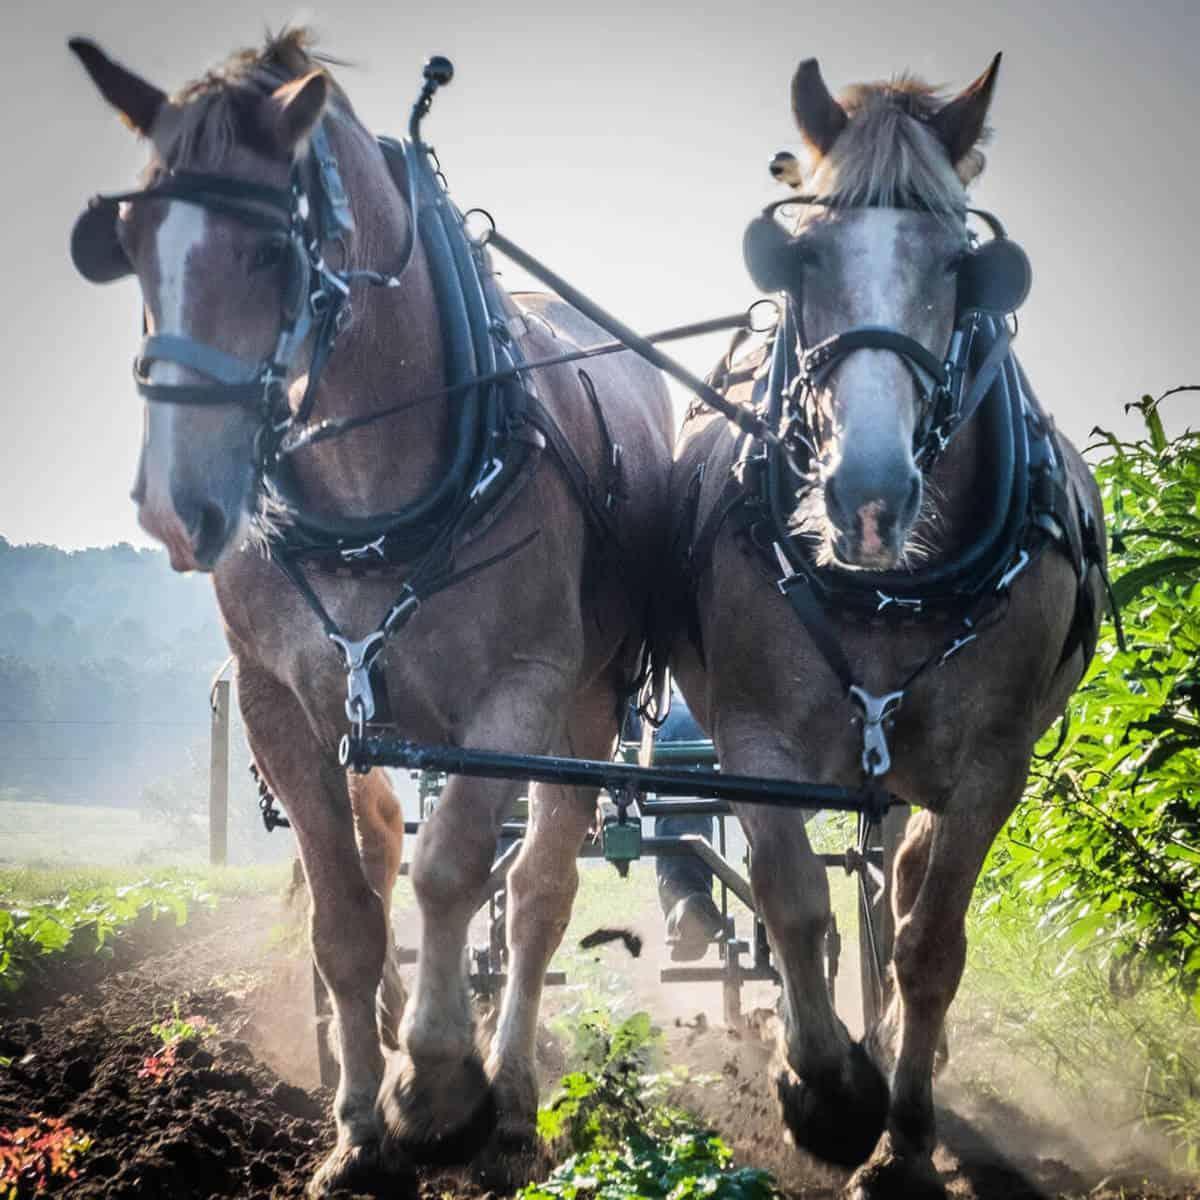 Draft horses pulling a plow